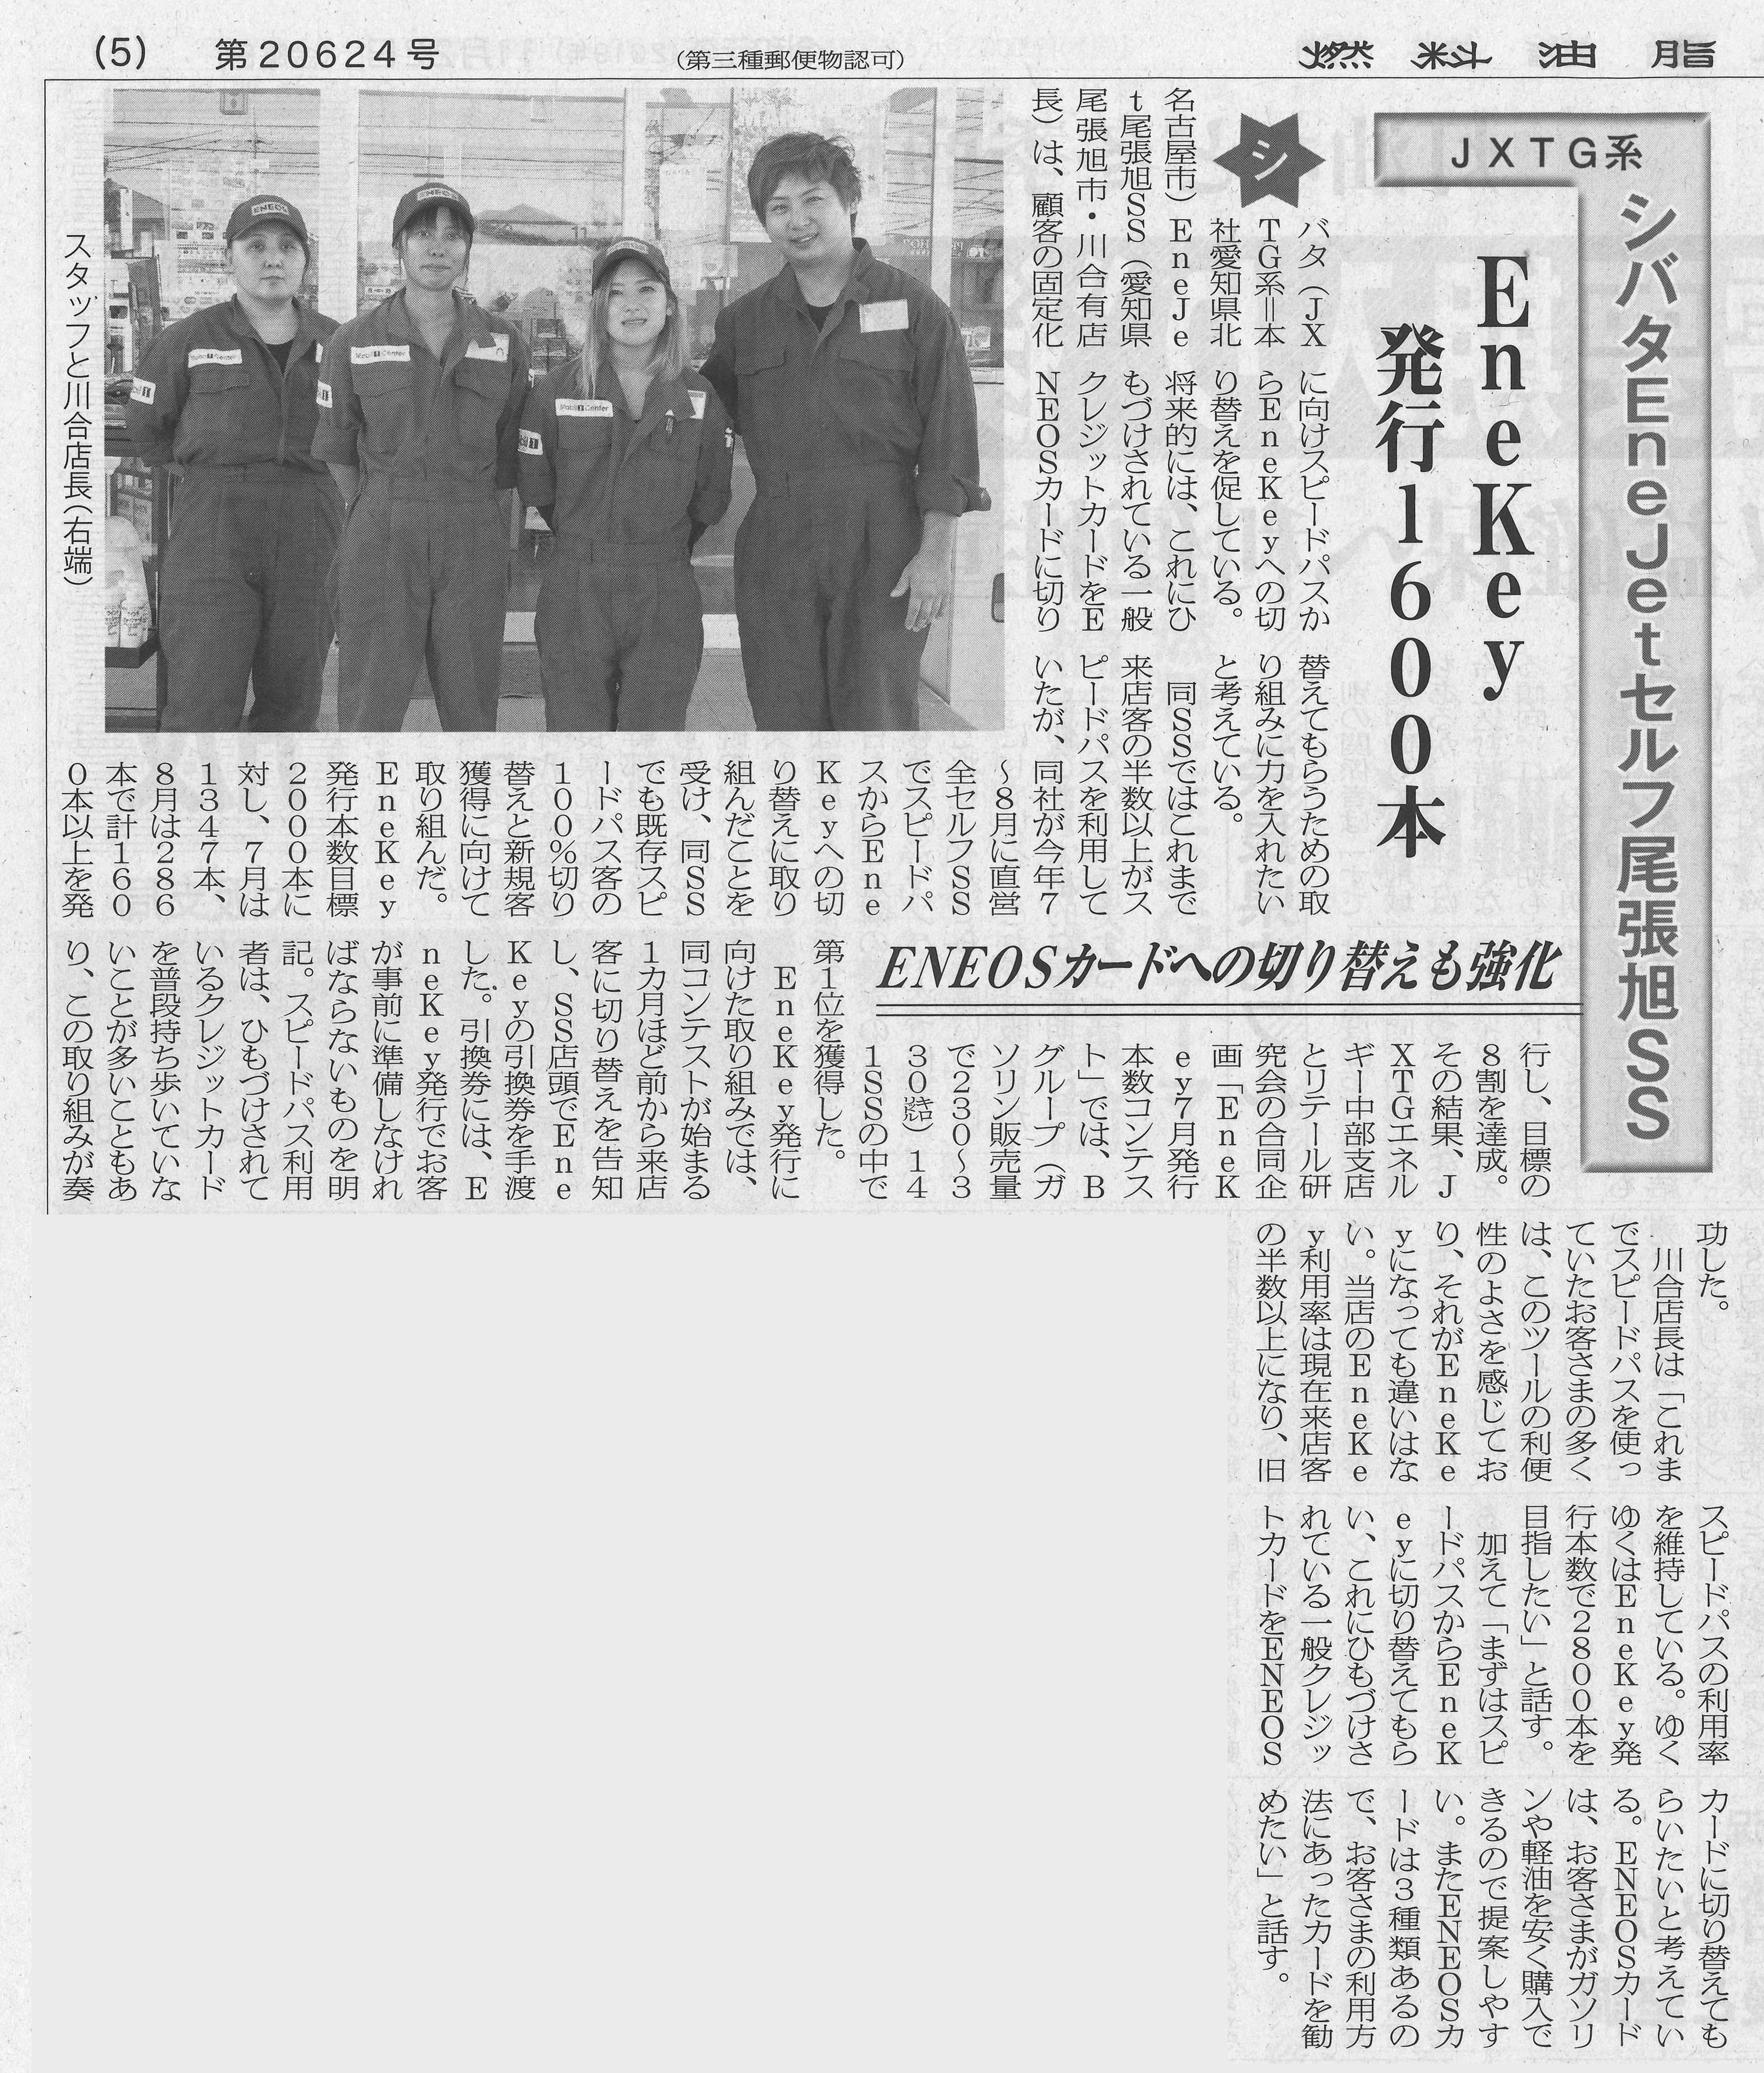 EneKey 発行1,600本 (燃料油脂新聞に掲載されました)